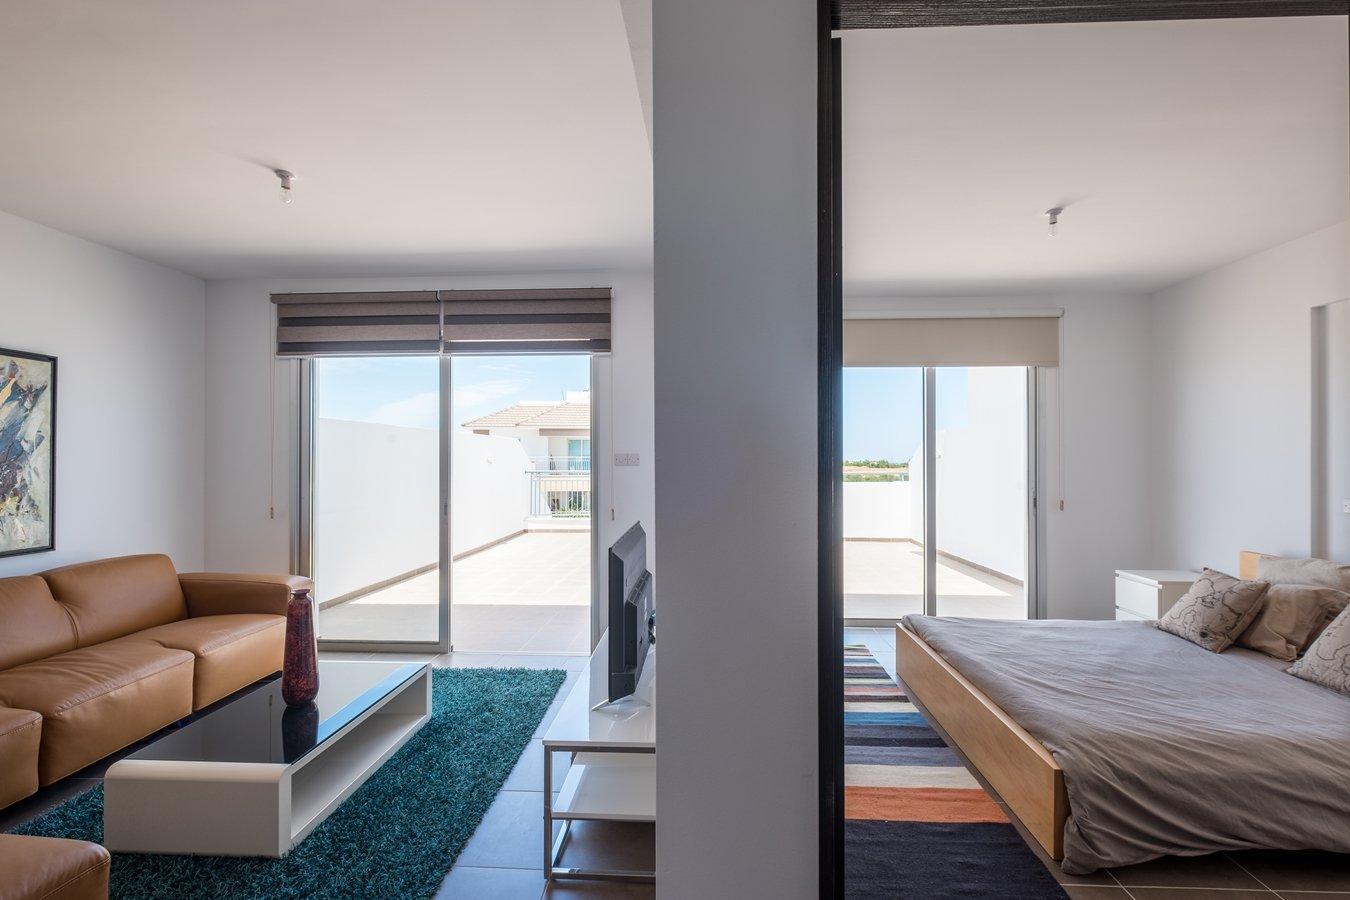 Chara-Kypria-Apartments-204-DSCF0535-HDR